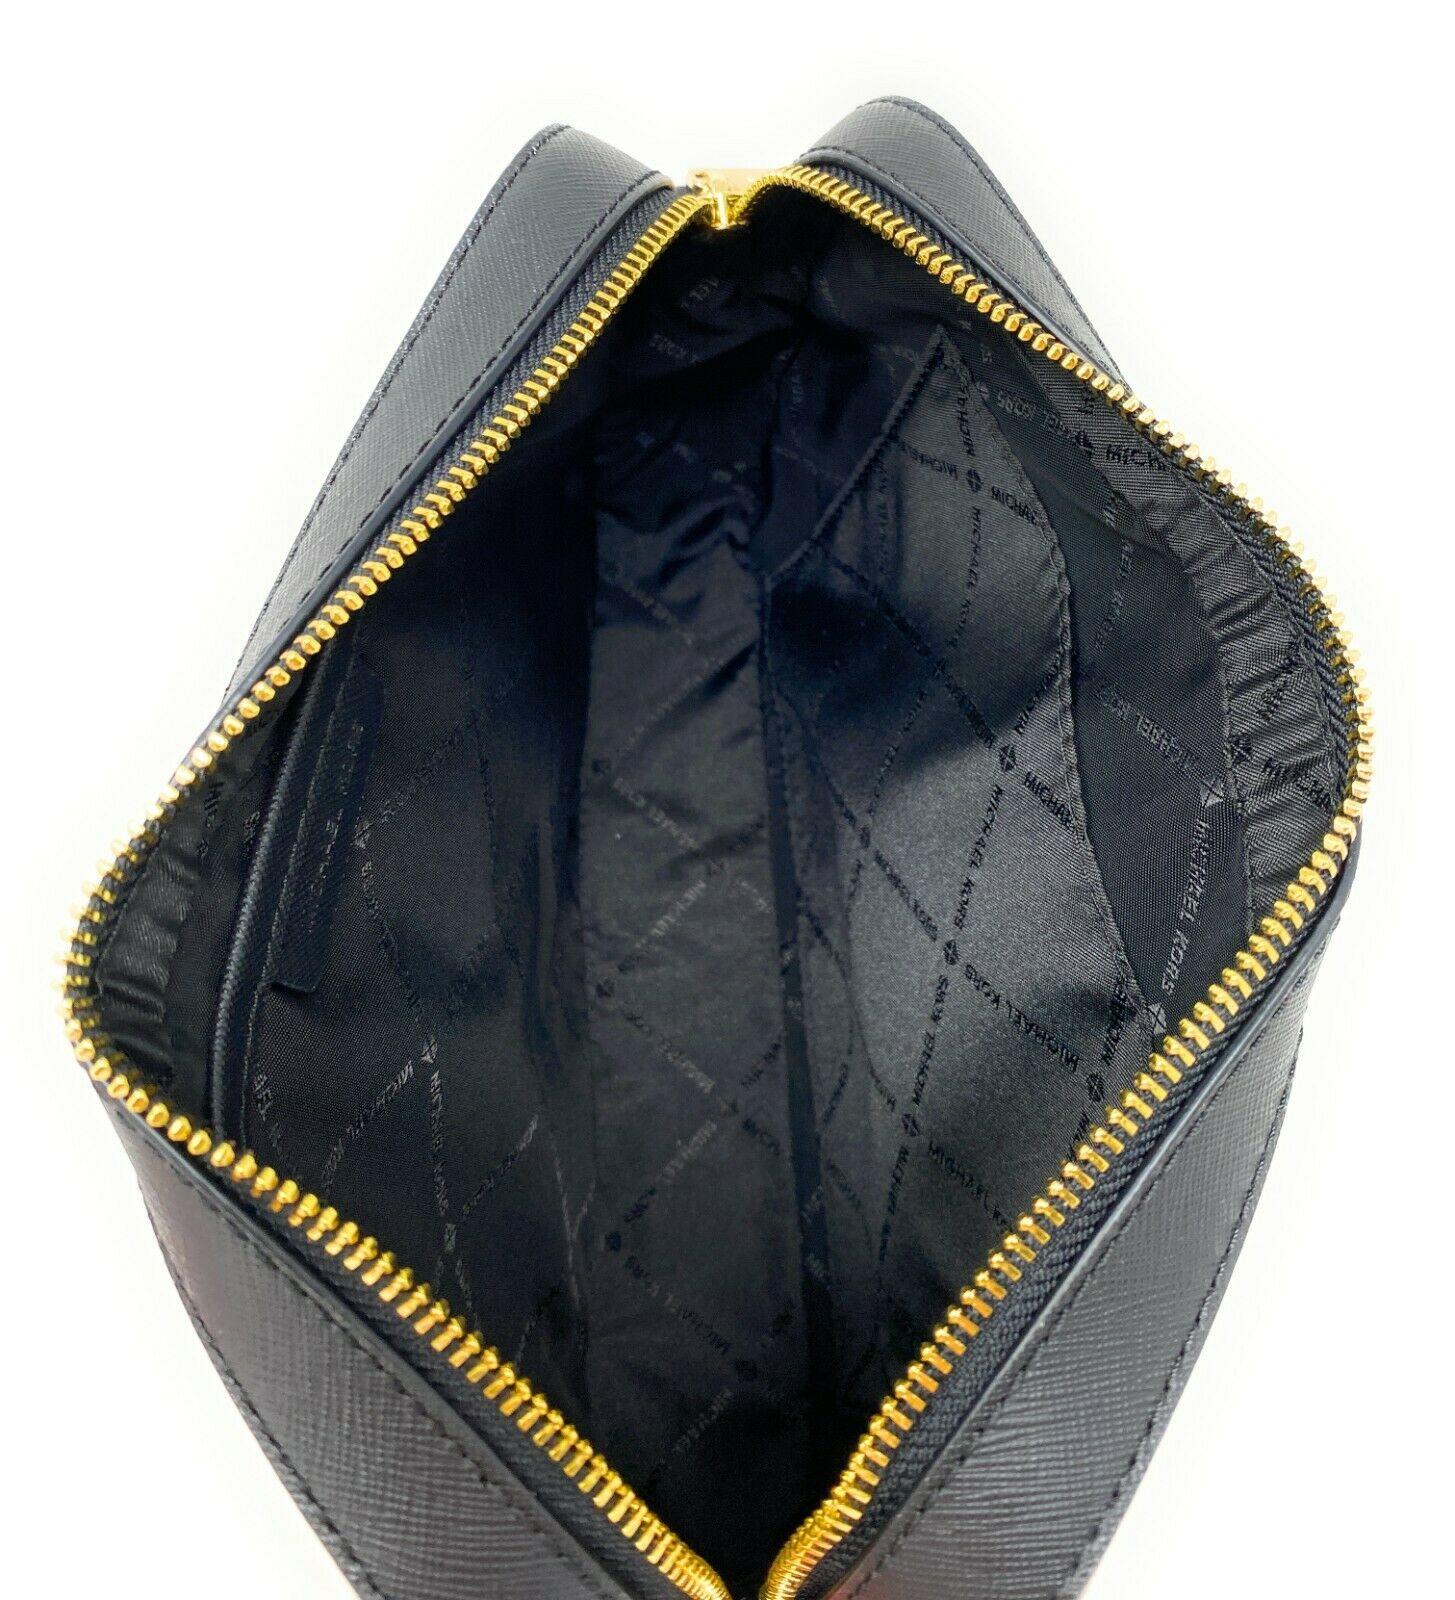 thumbnail 43 - Michael Kors Jet Set Item Large East West Crossbody Chain Handbag Clutch $298